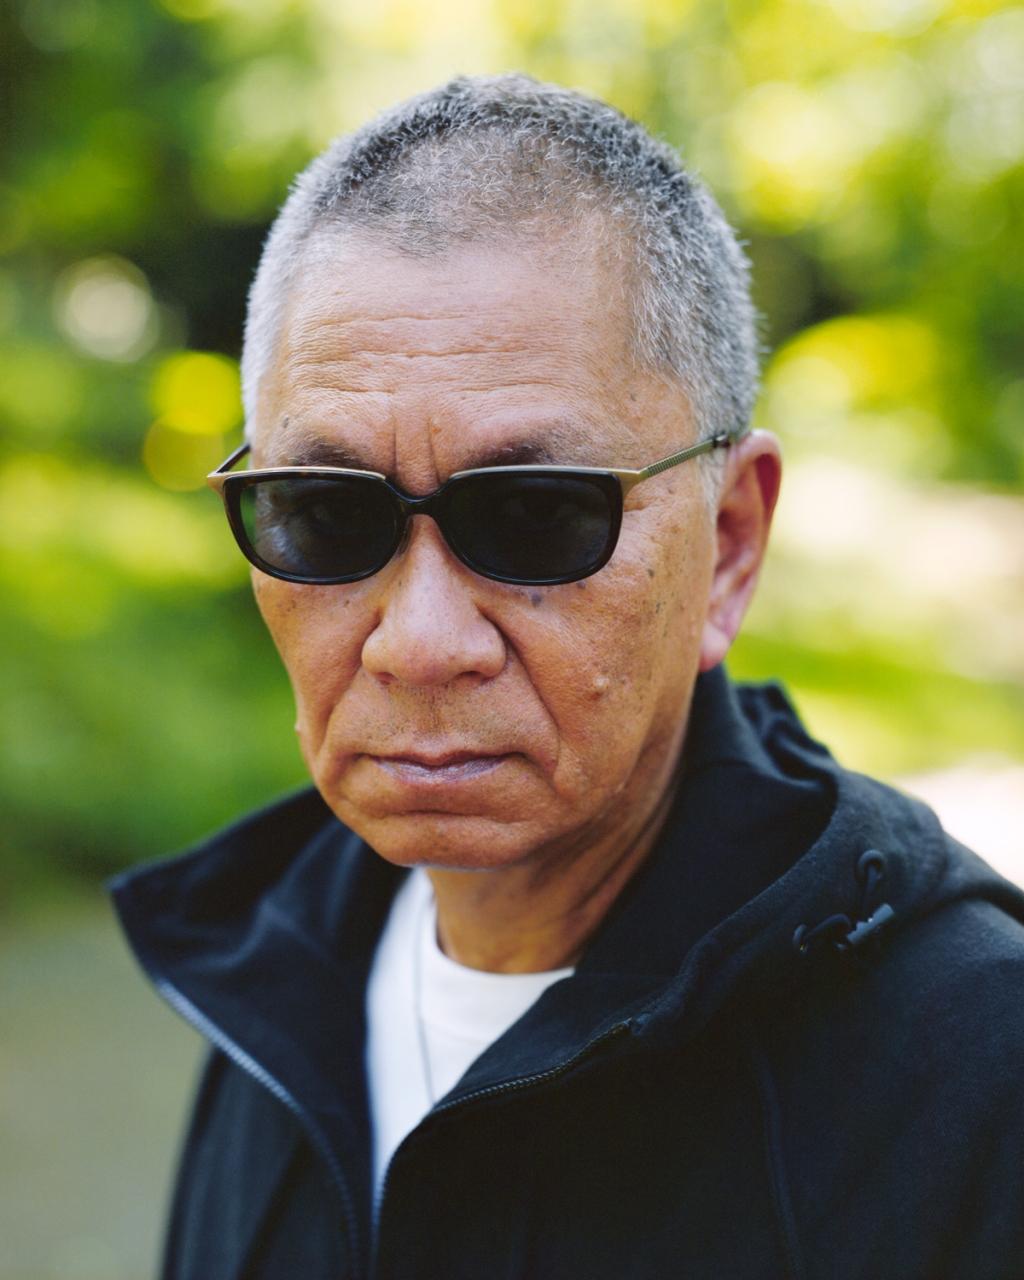 FRANÇOIS CAVELIER Filmmaker TAKASHI MIIKE 三池 崇史. Tokyo. FLAUNT Magazine